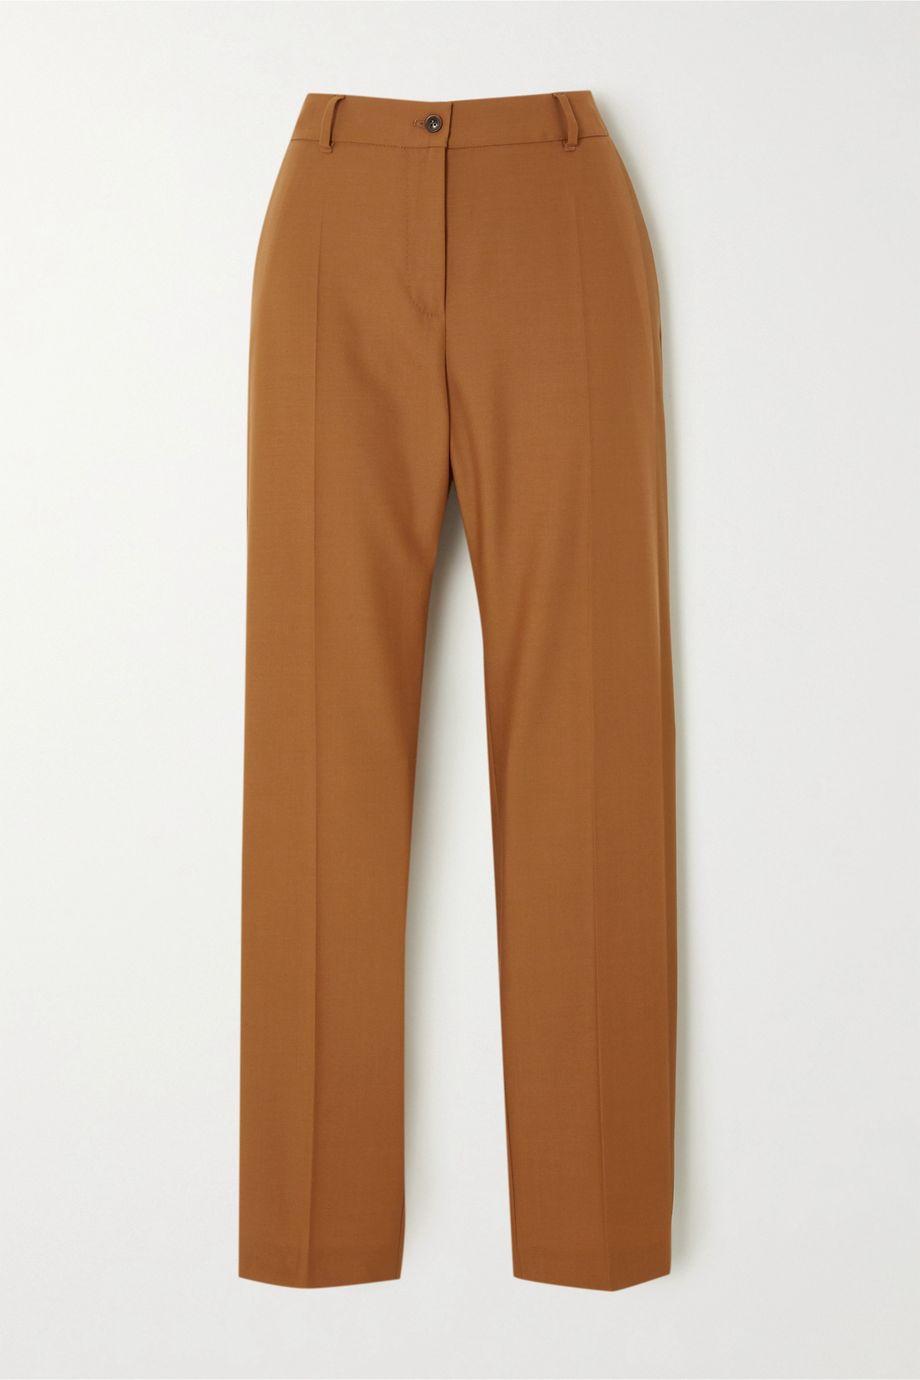 Agnona Eternals 羊毛斜纹布窄腿裤